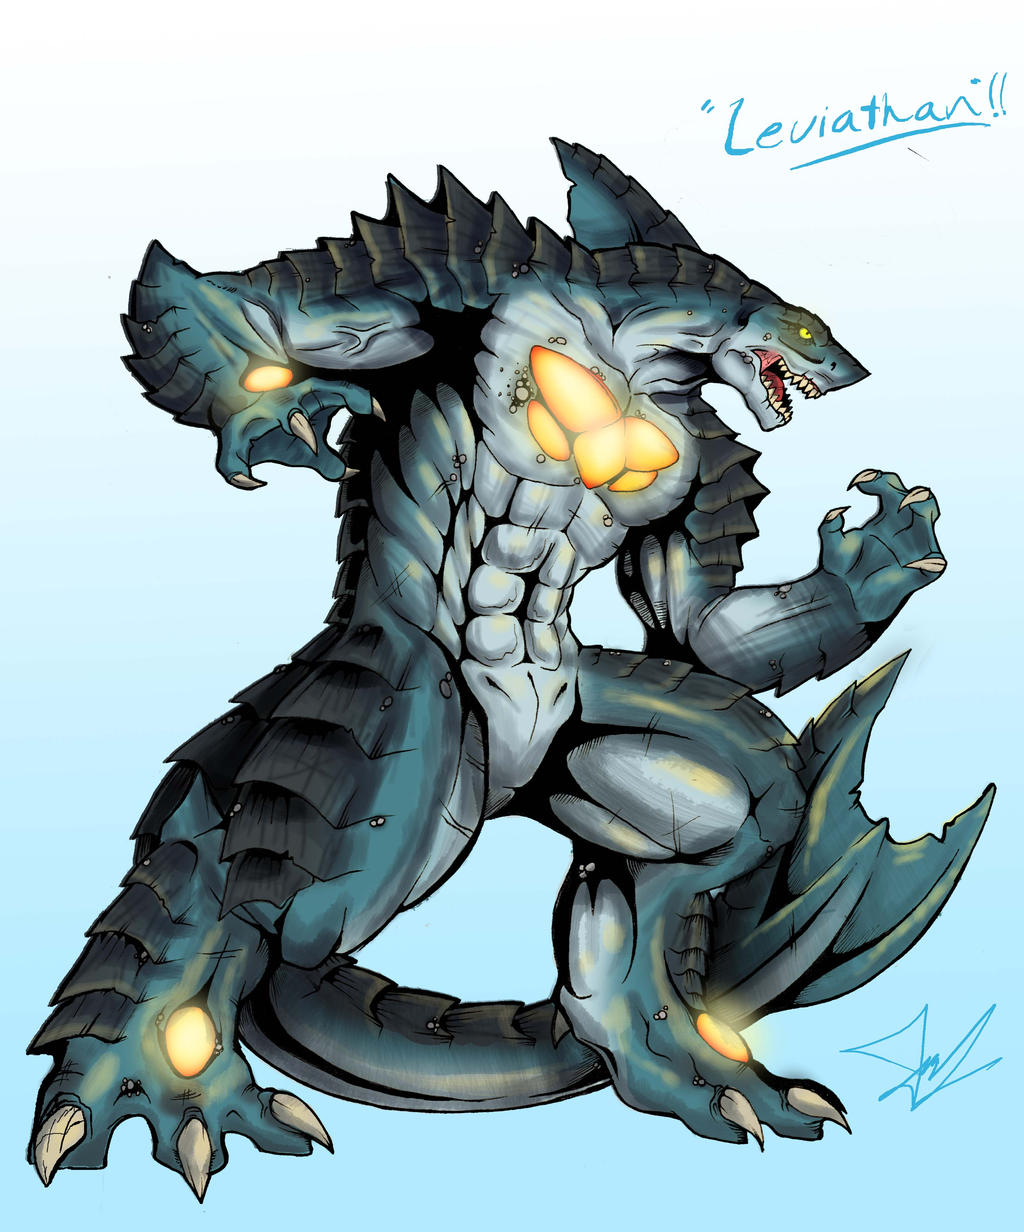 Kaiju Wars: The Leviathan by Blabyloo229